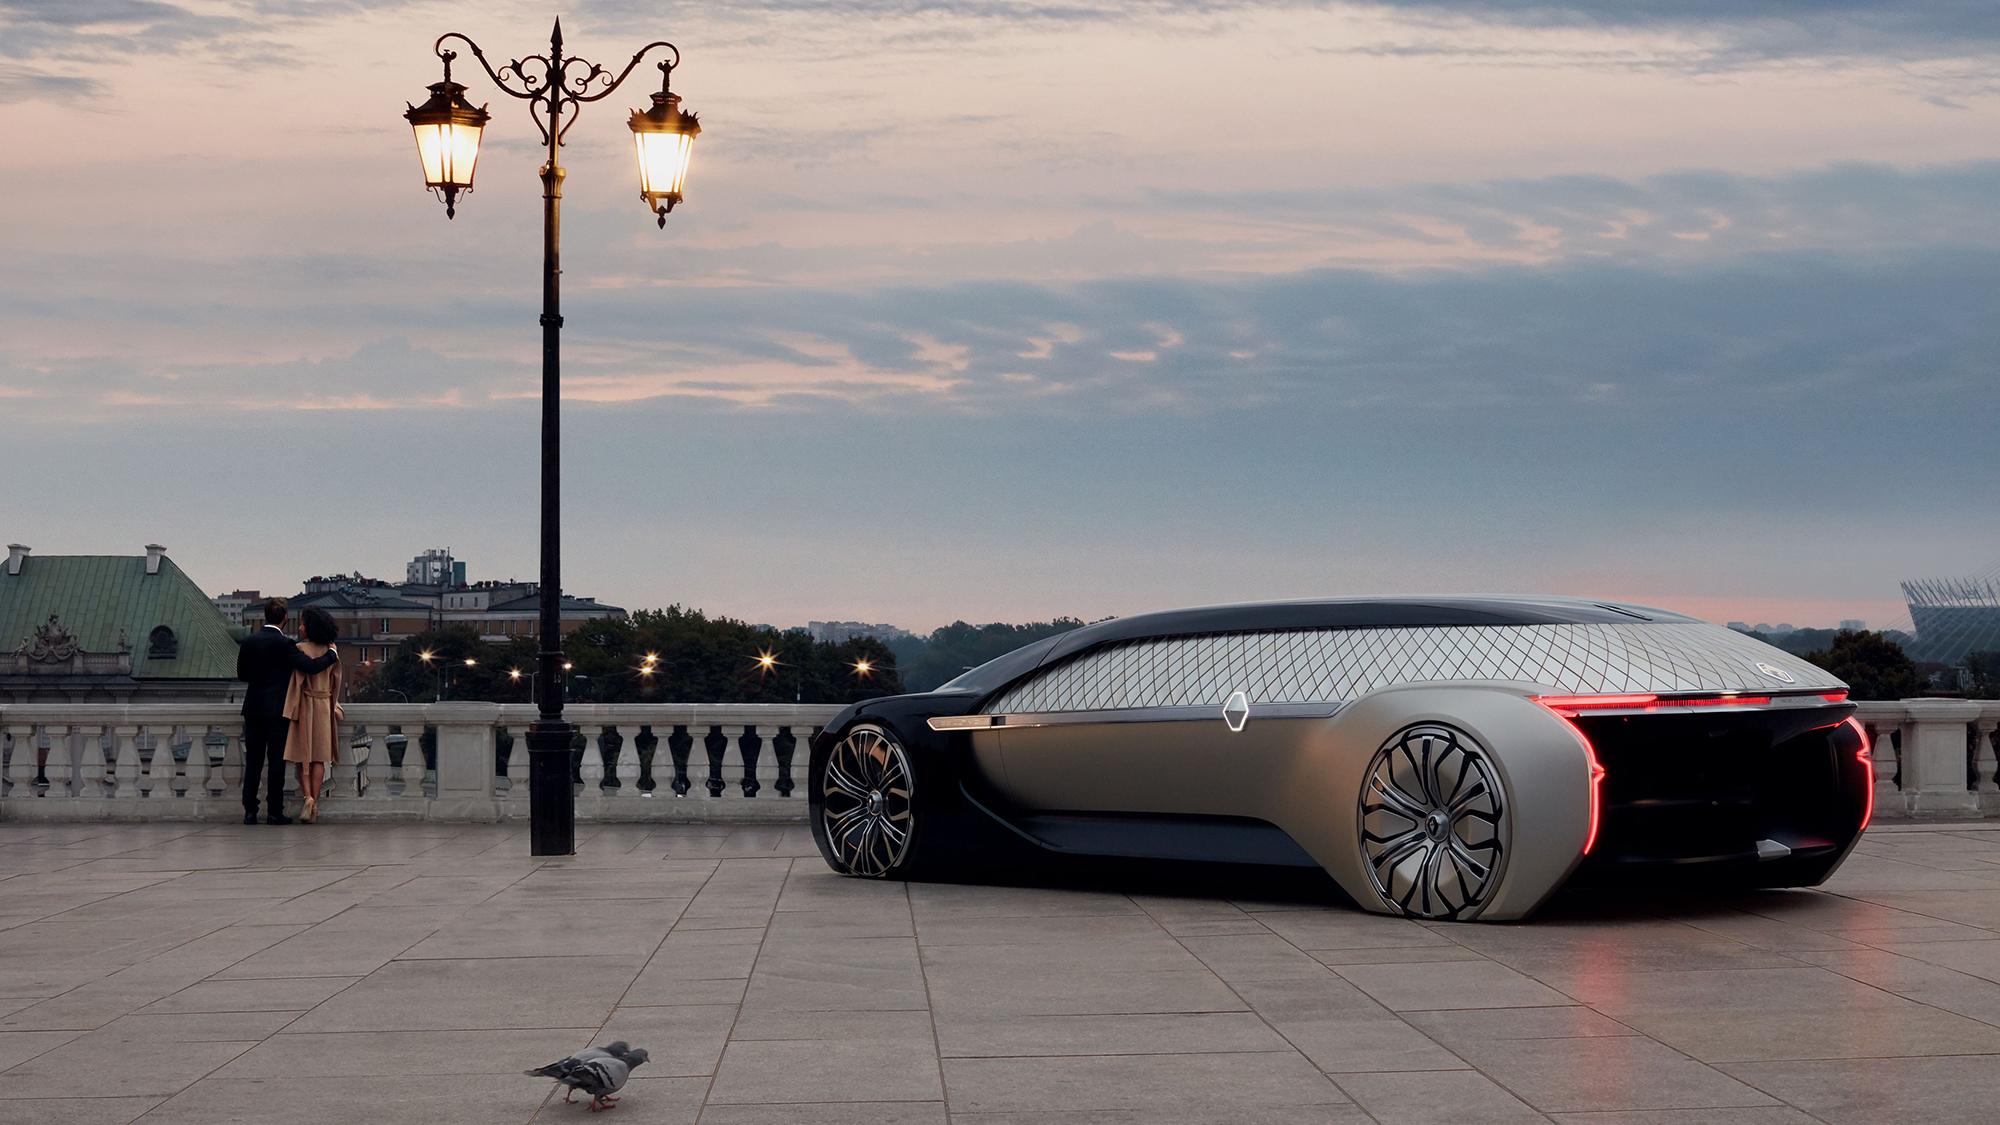 Renault S New Concept Car Is Opulent Self Driving Luxury Paris Style